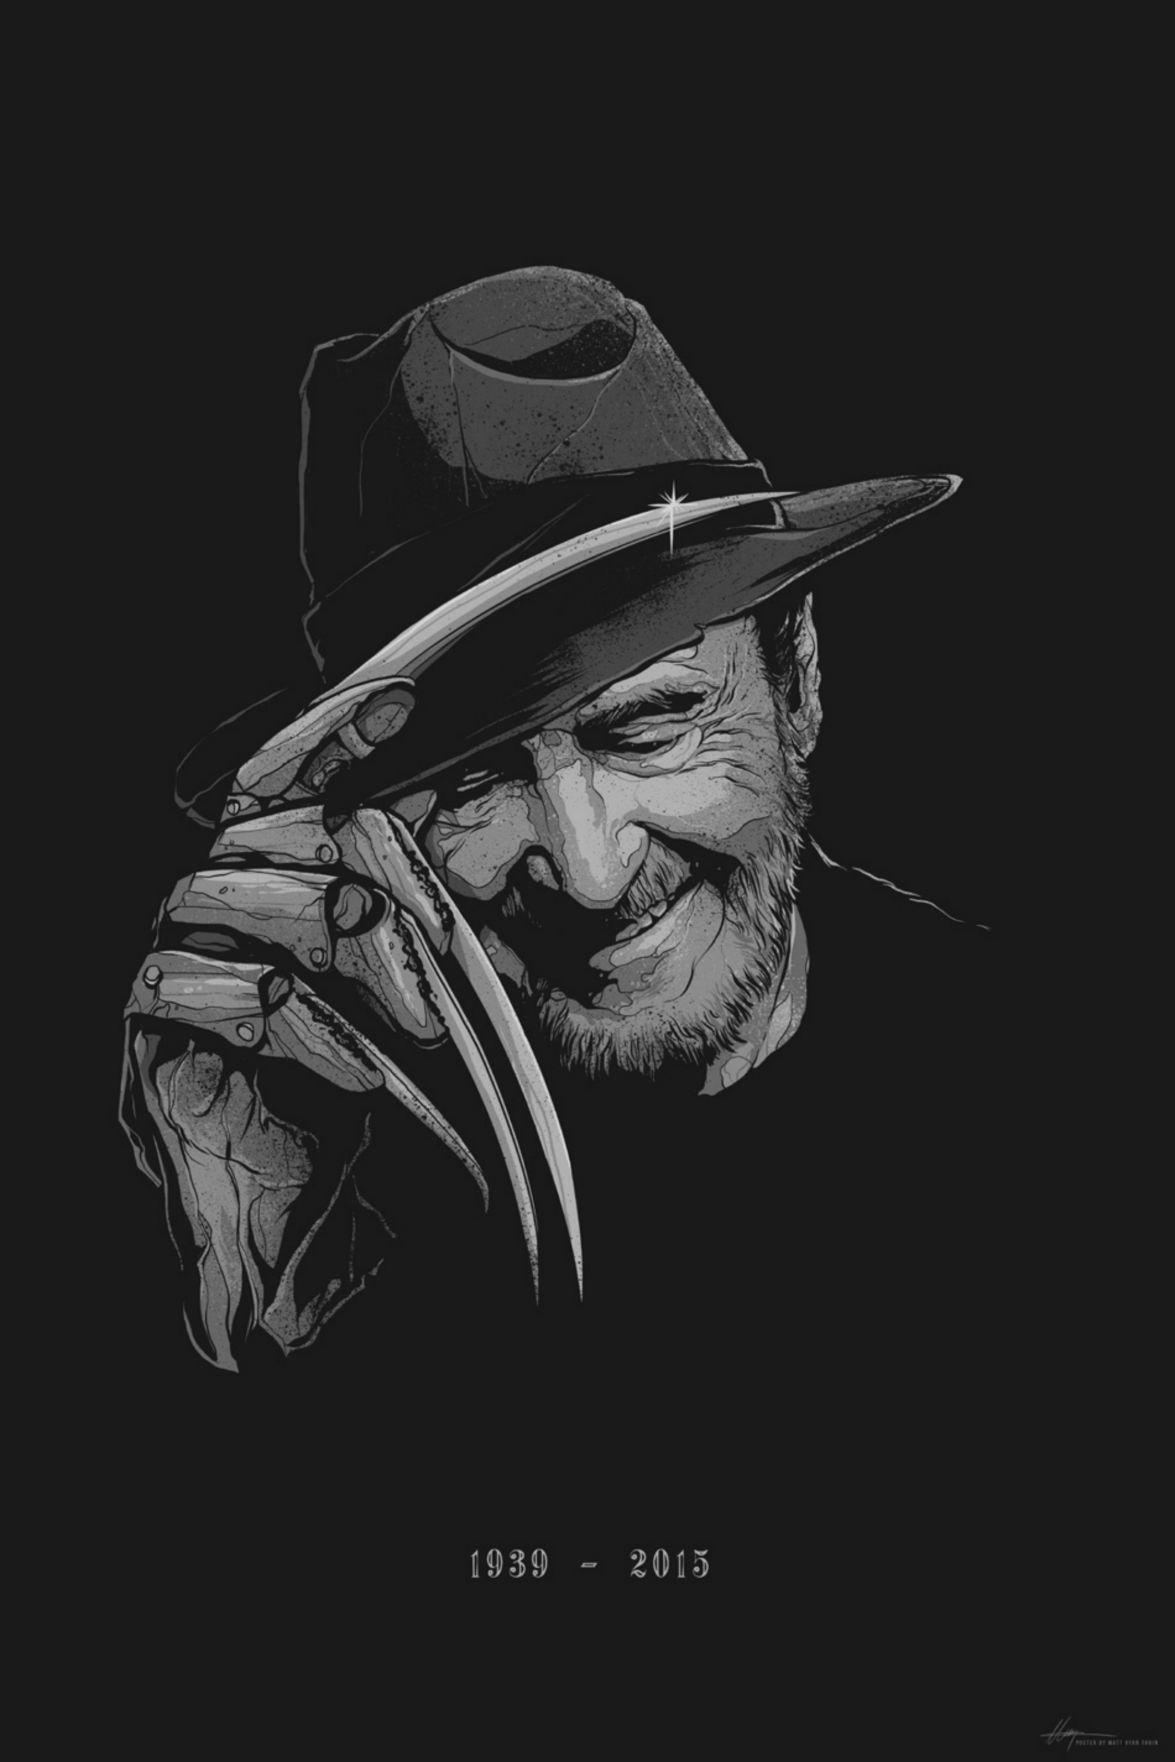 A Nightmare on Elm Street reunion